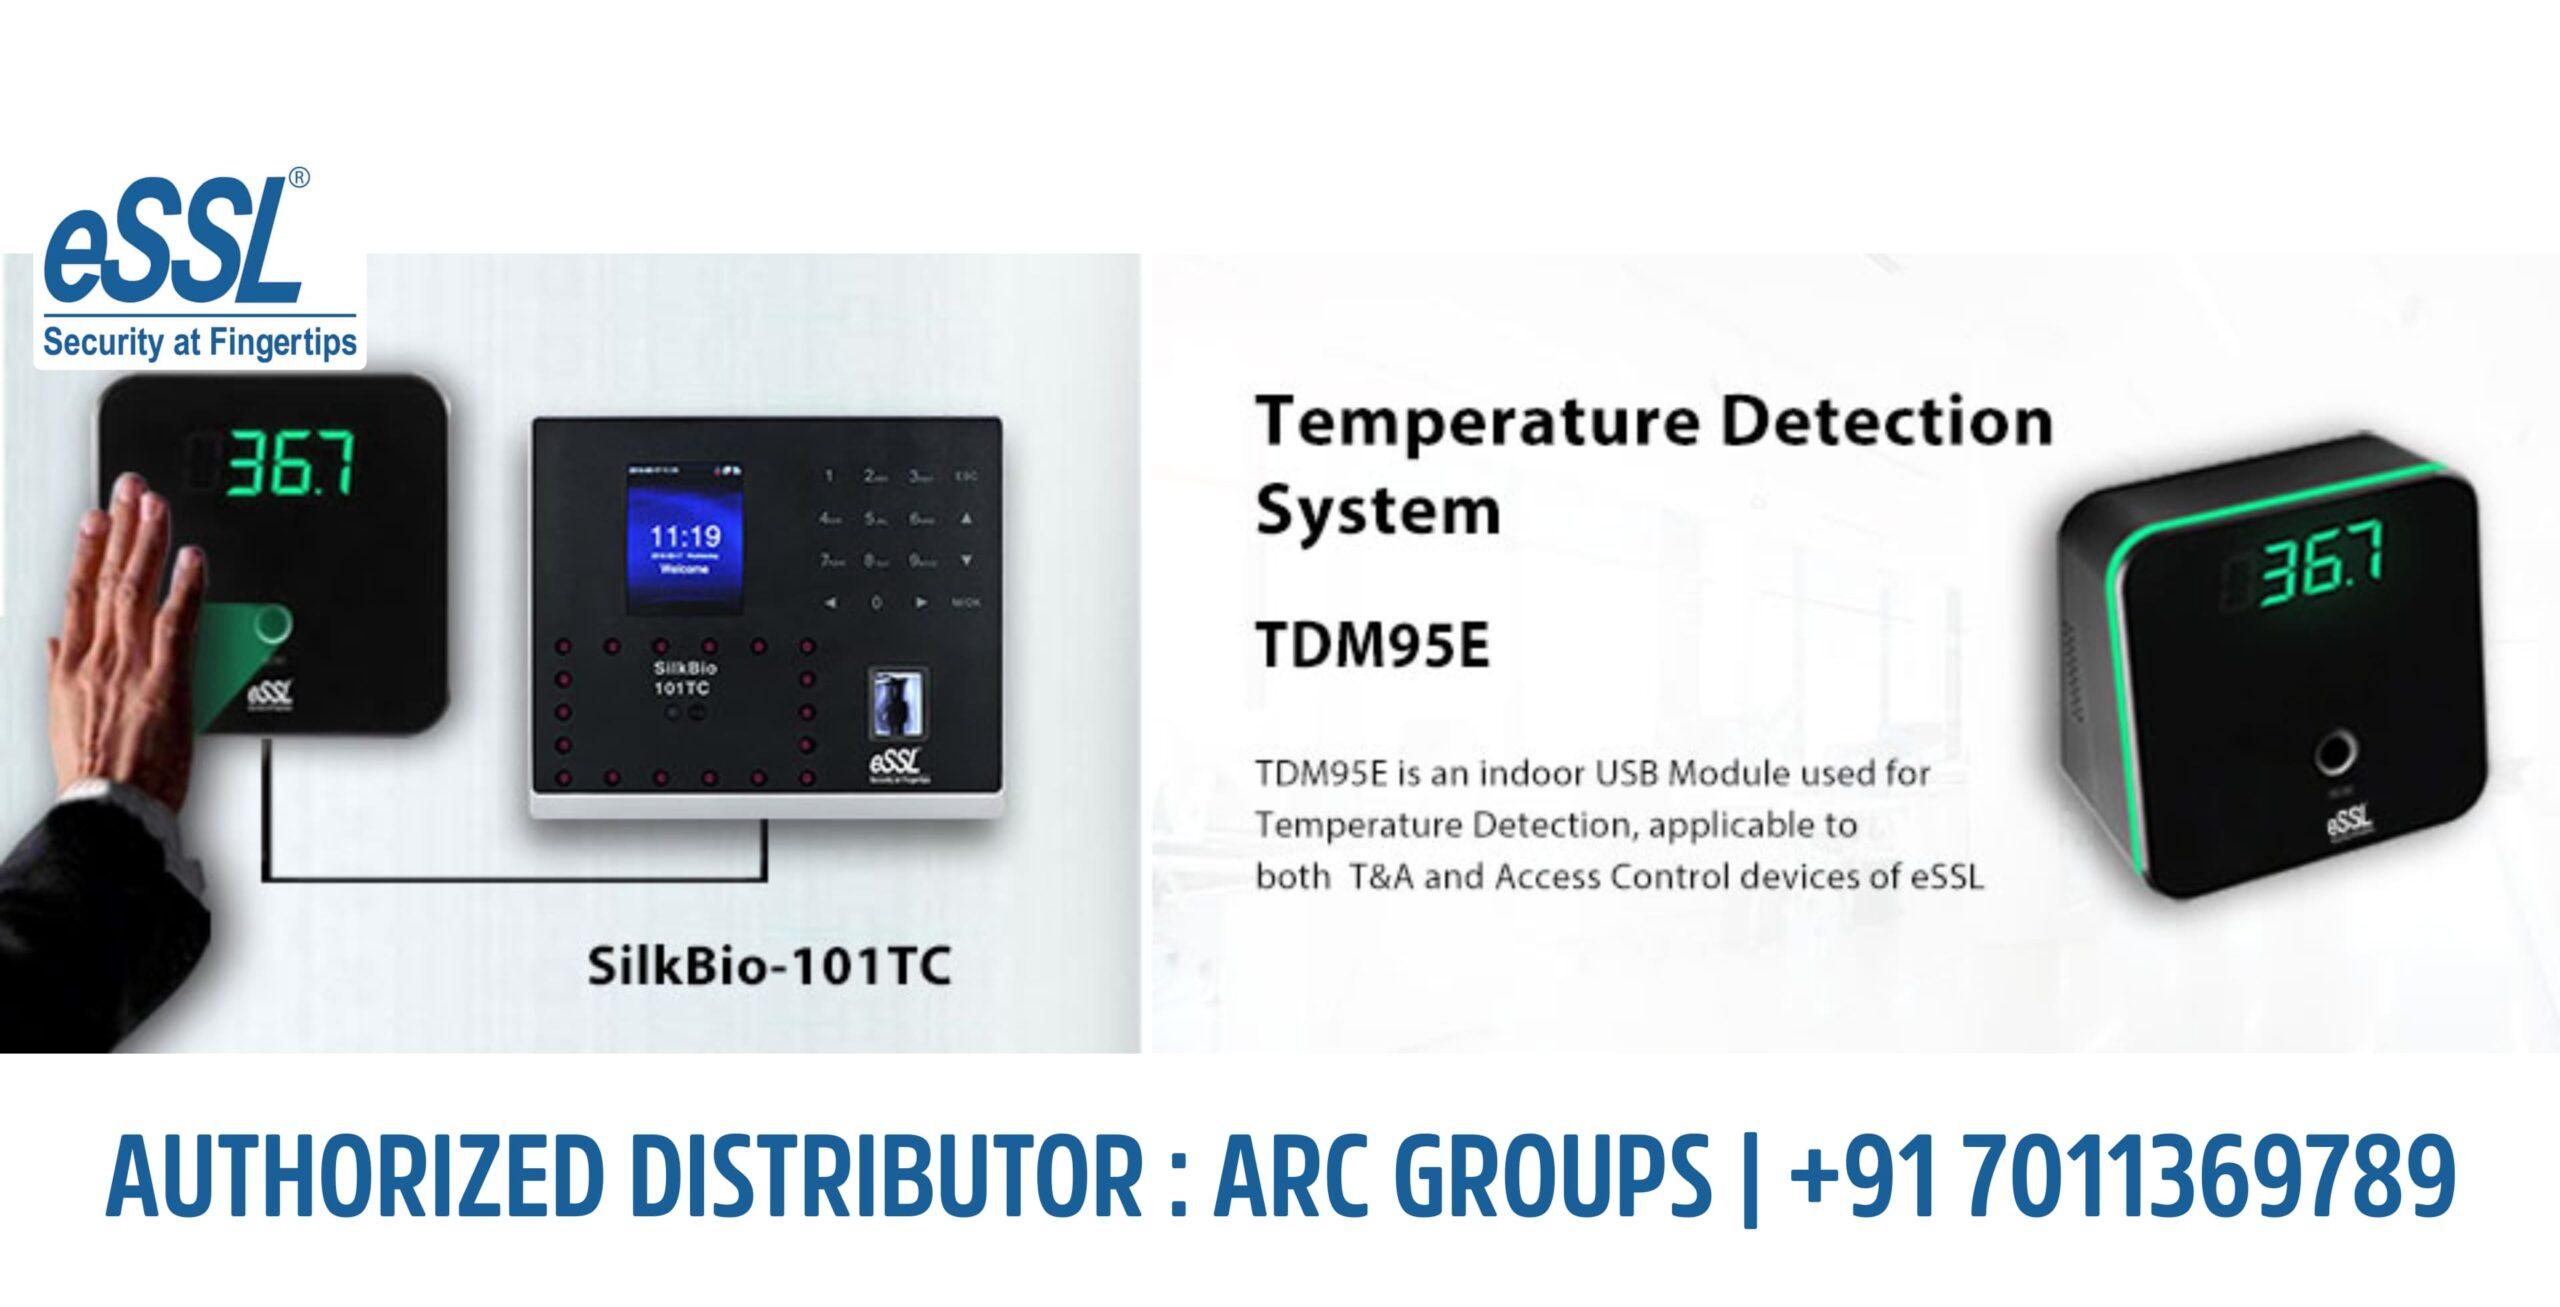 eSSL TDM95E Temprature Detection System